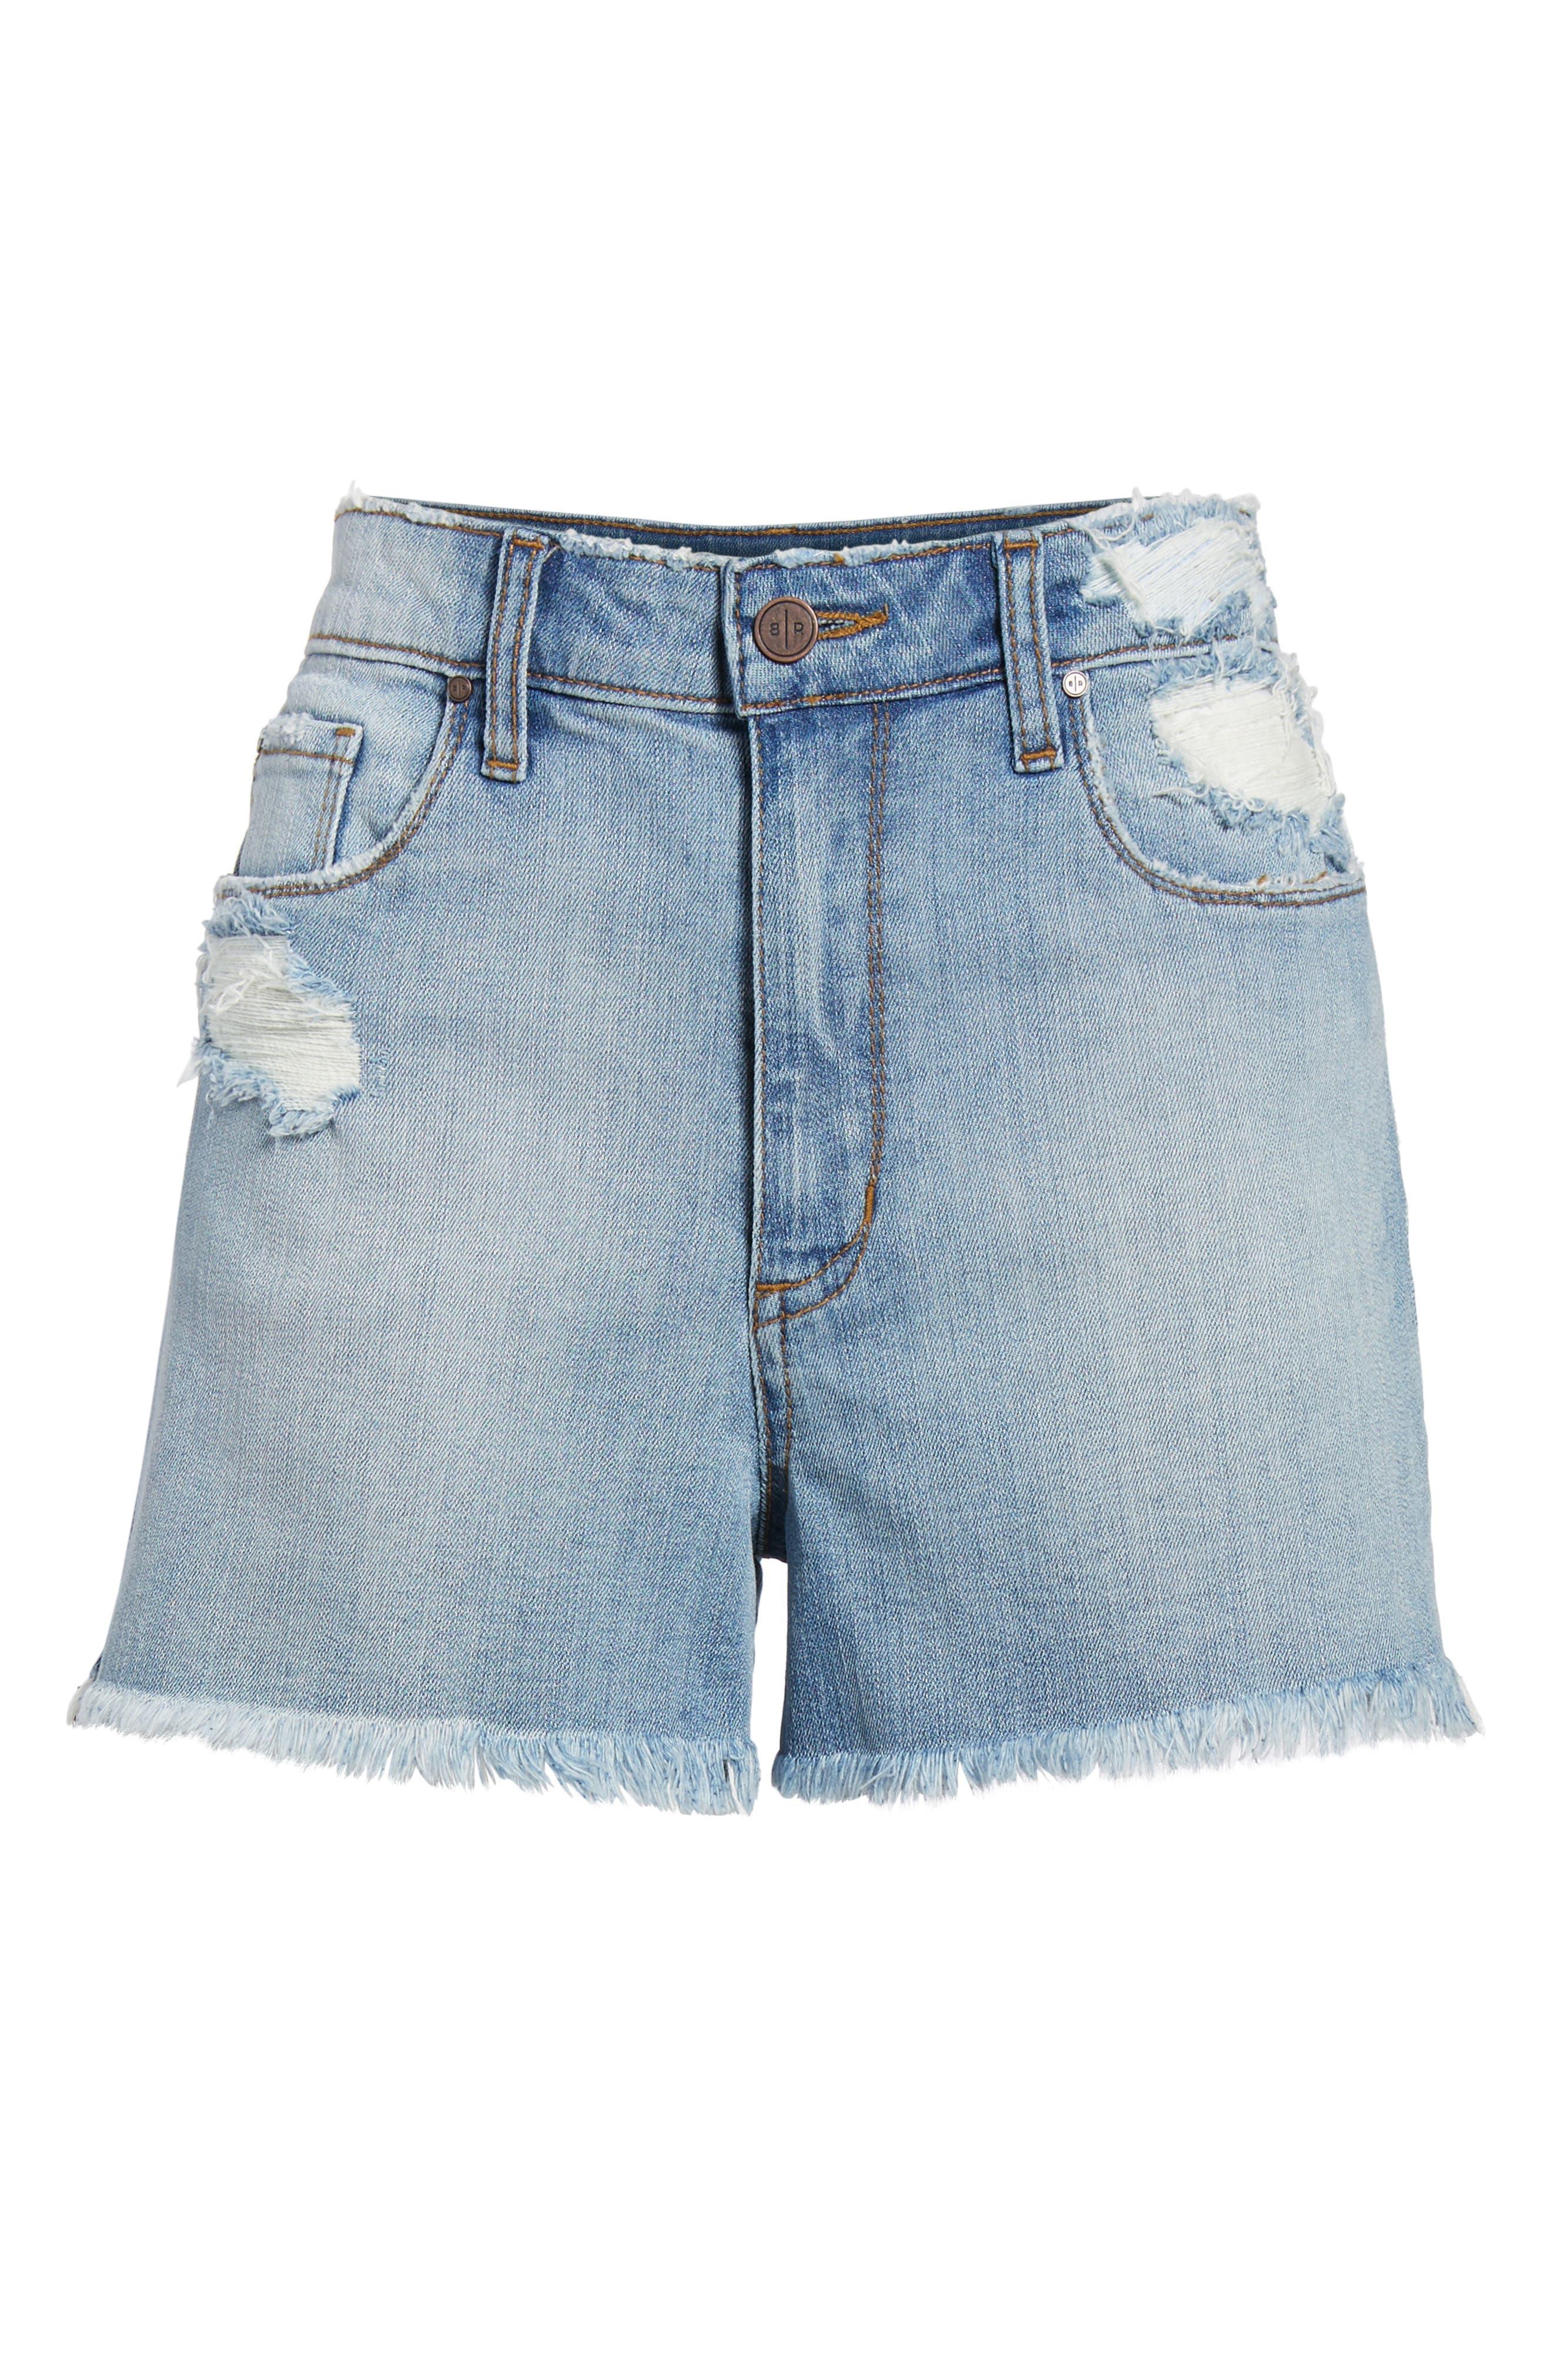 High Waist Distressed Denim Shorts,                             Alternate thumbnail 6, color,